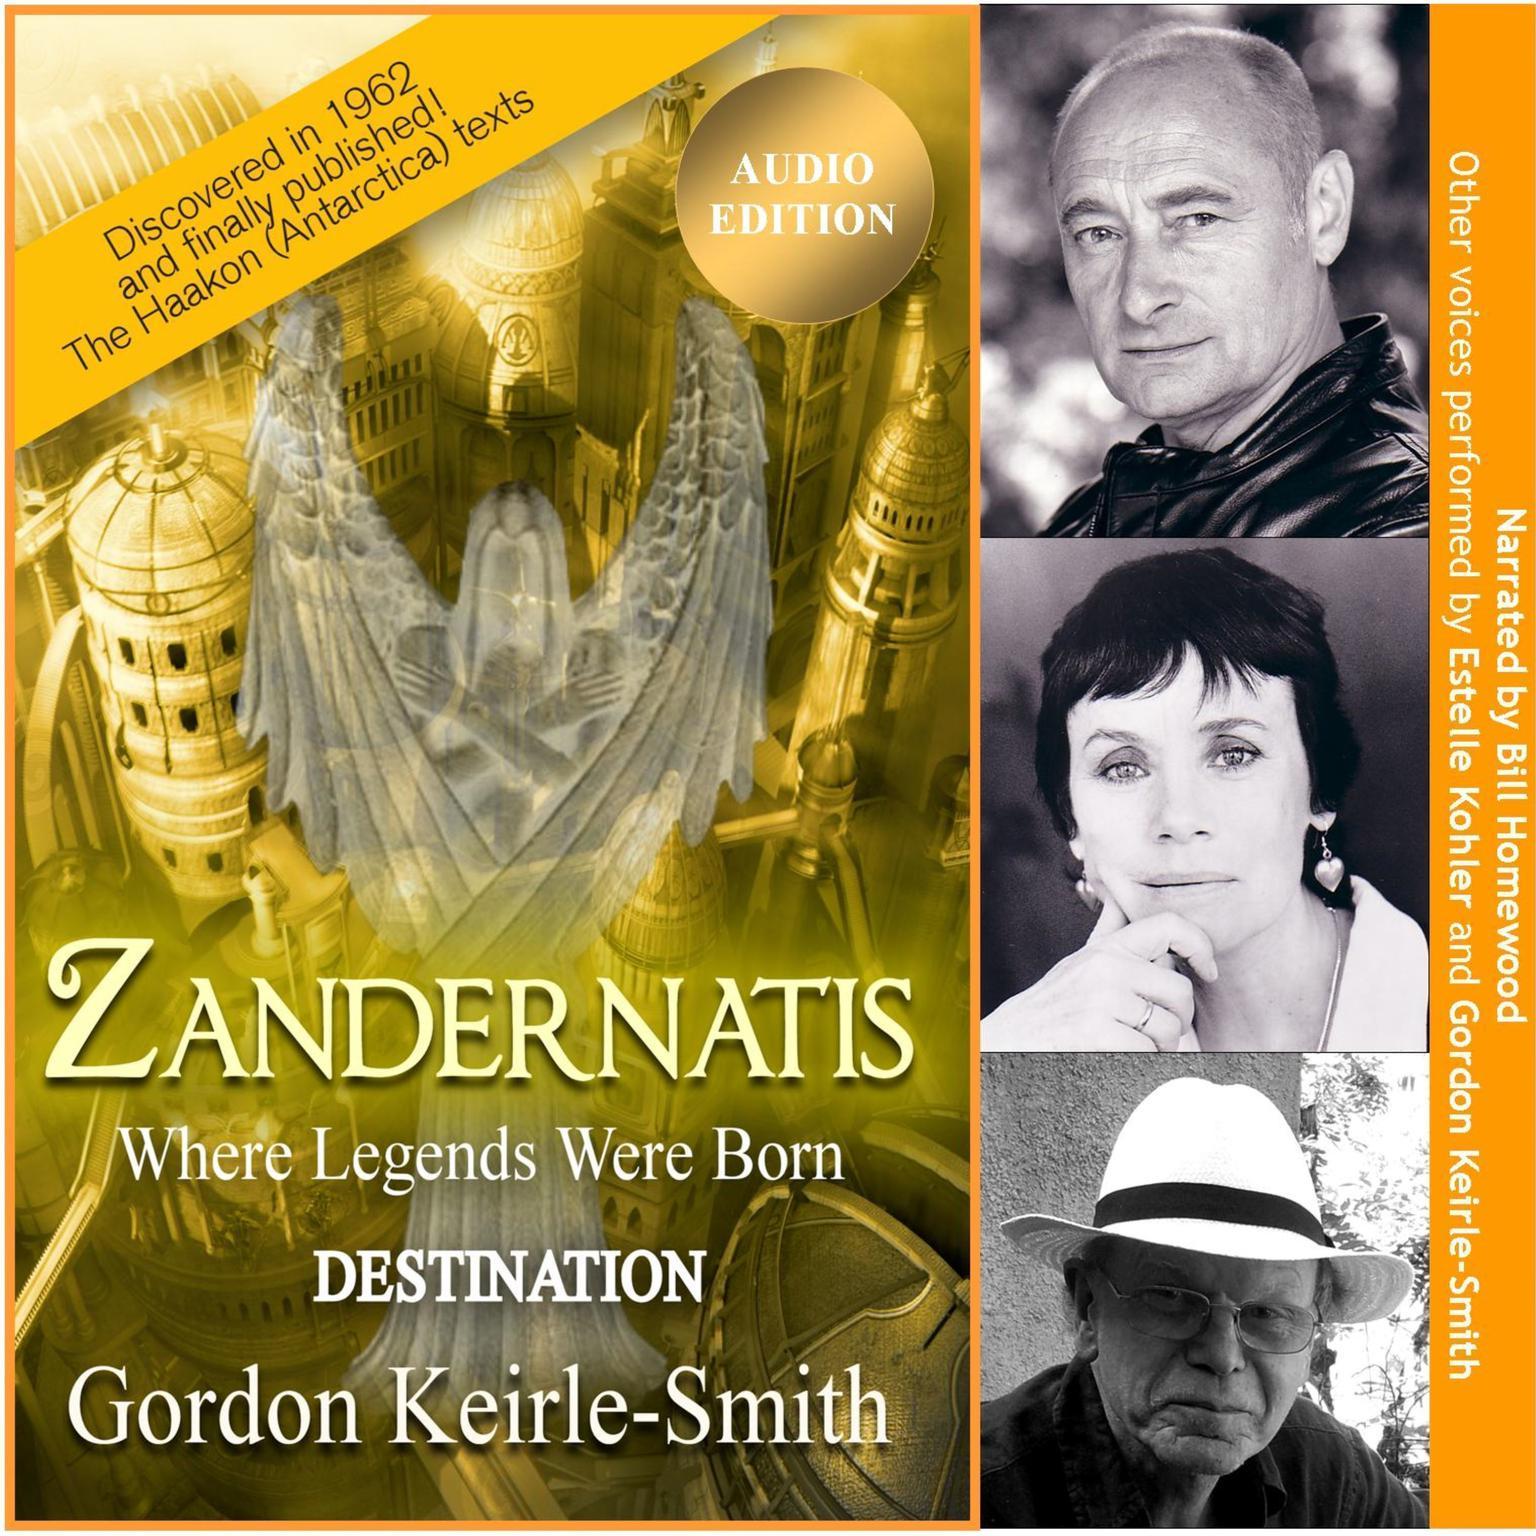 Zandernatis - Volume Two - Destination Audiobook, by Gordon Keirle-Smith